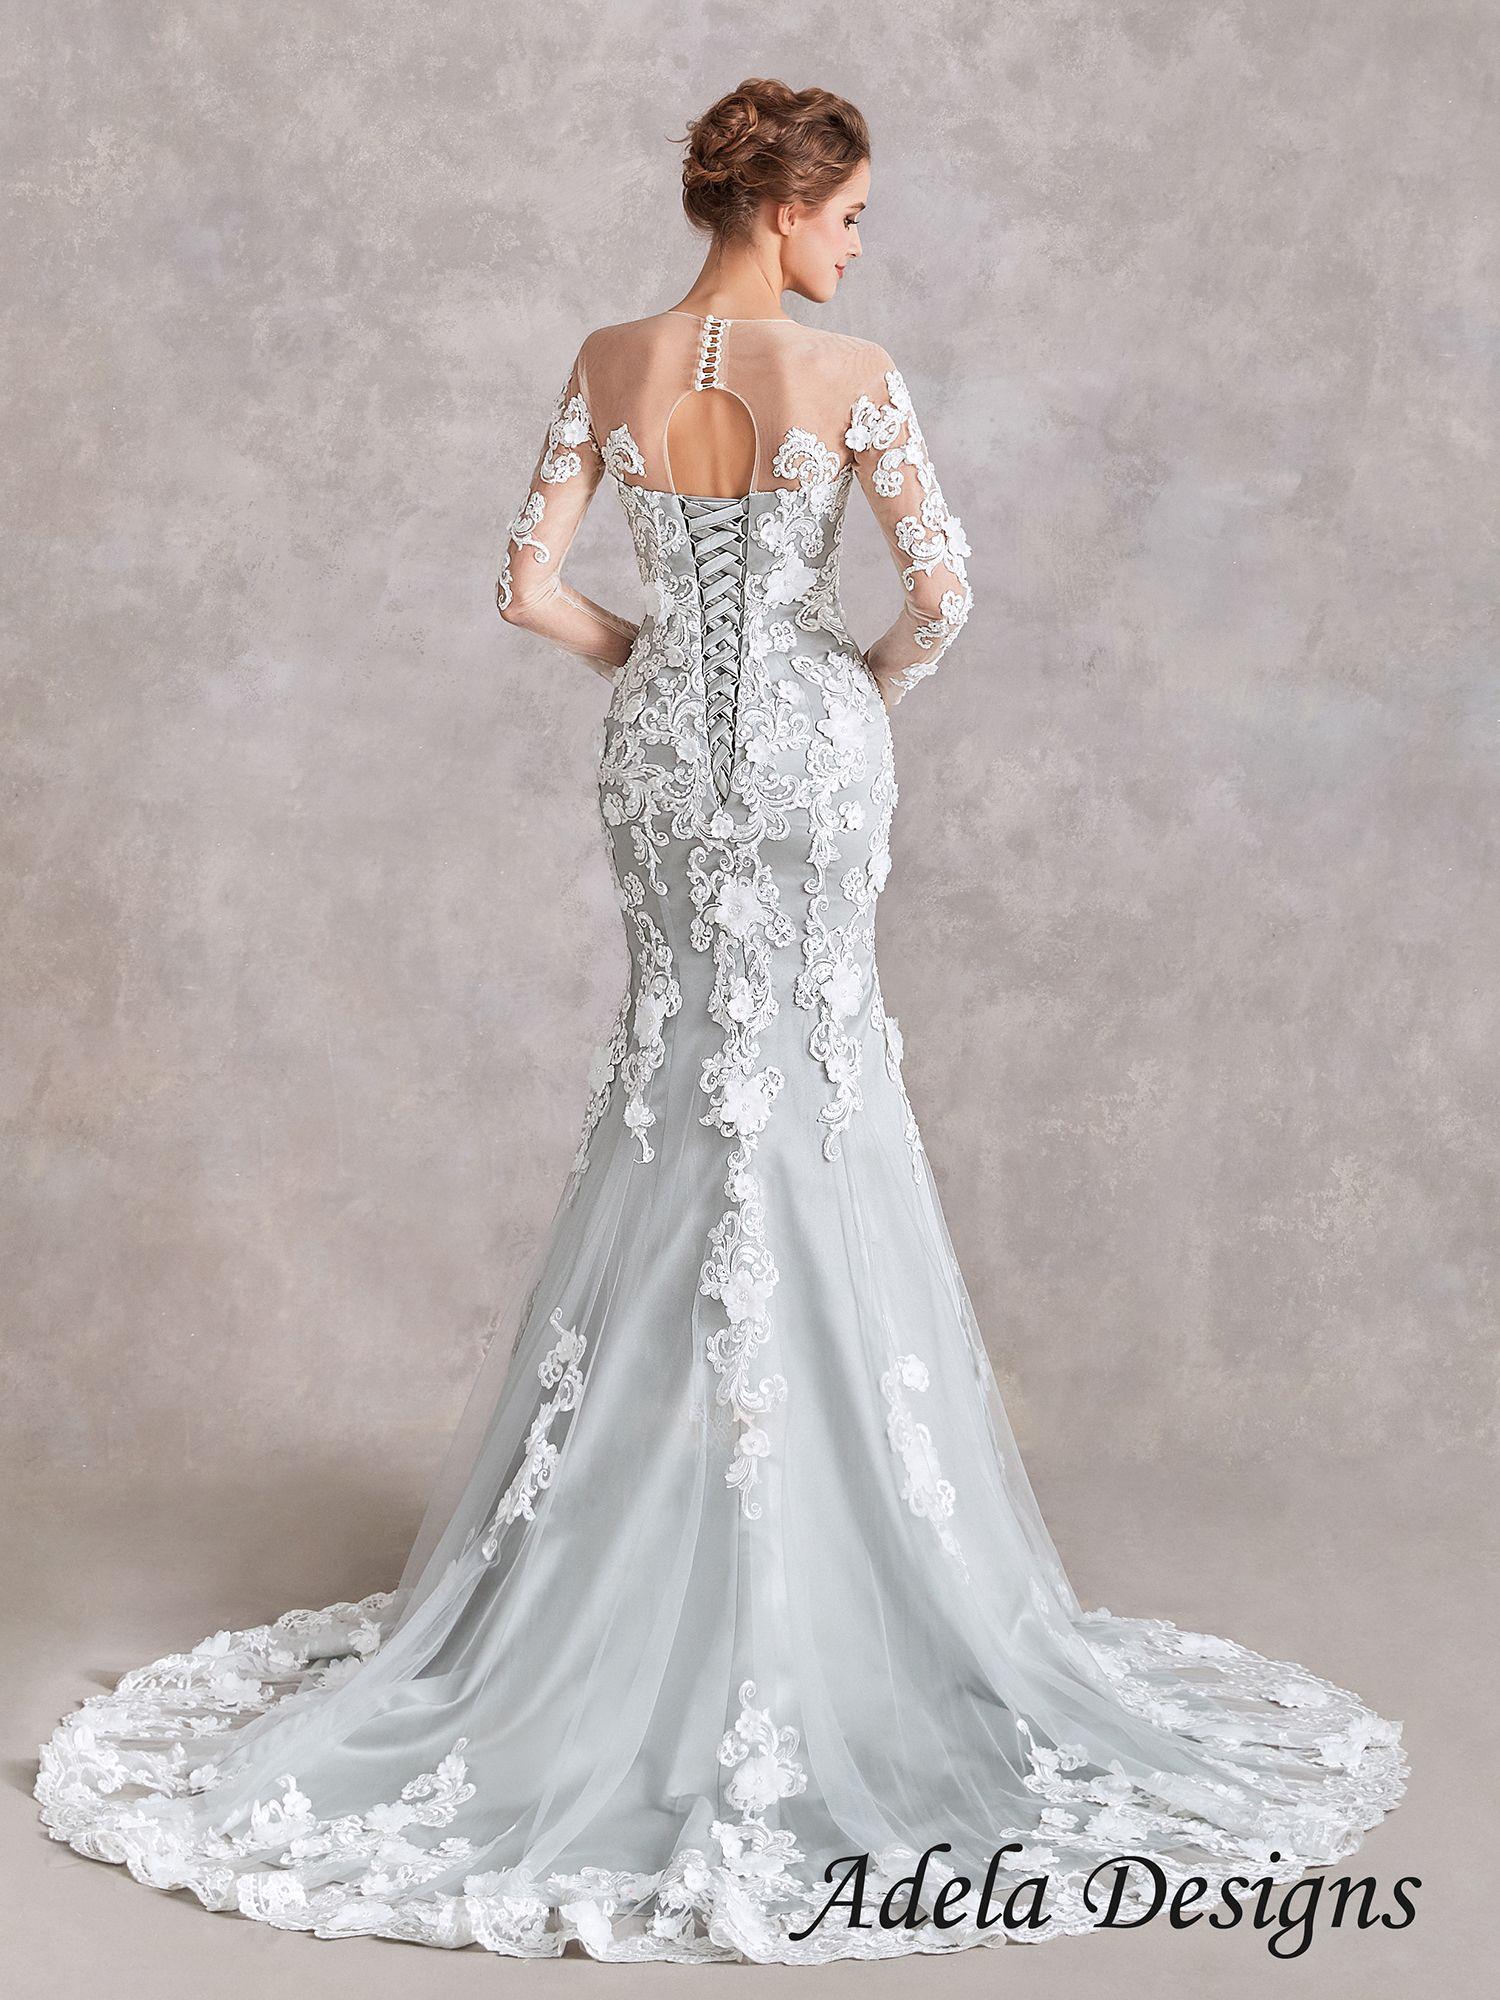 Silver Mermaid Wedding Dress Lace Bridal Gown Mermaid Trumpet Wedding Dresses Red Wedding Dresses [ 2000 x 1500 Pixel ]